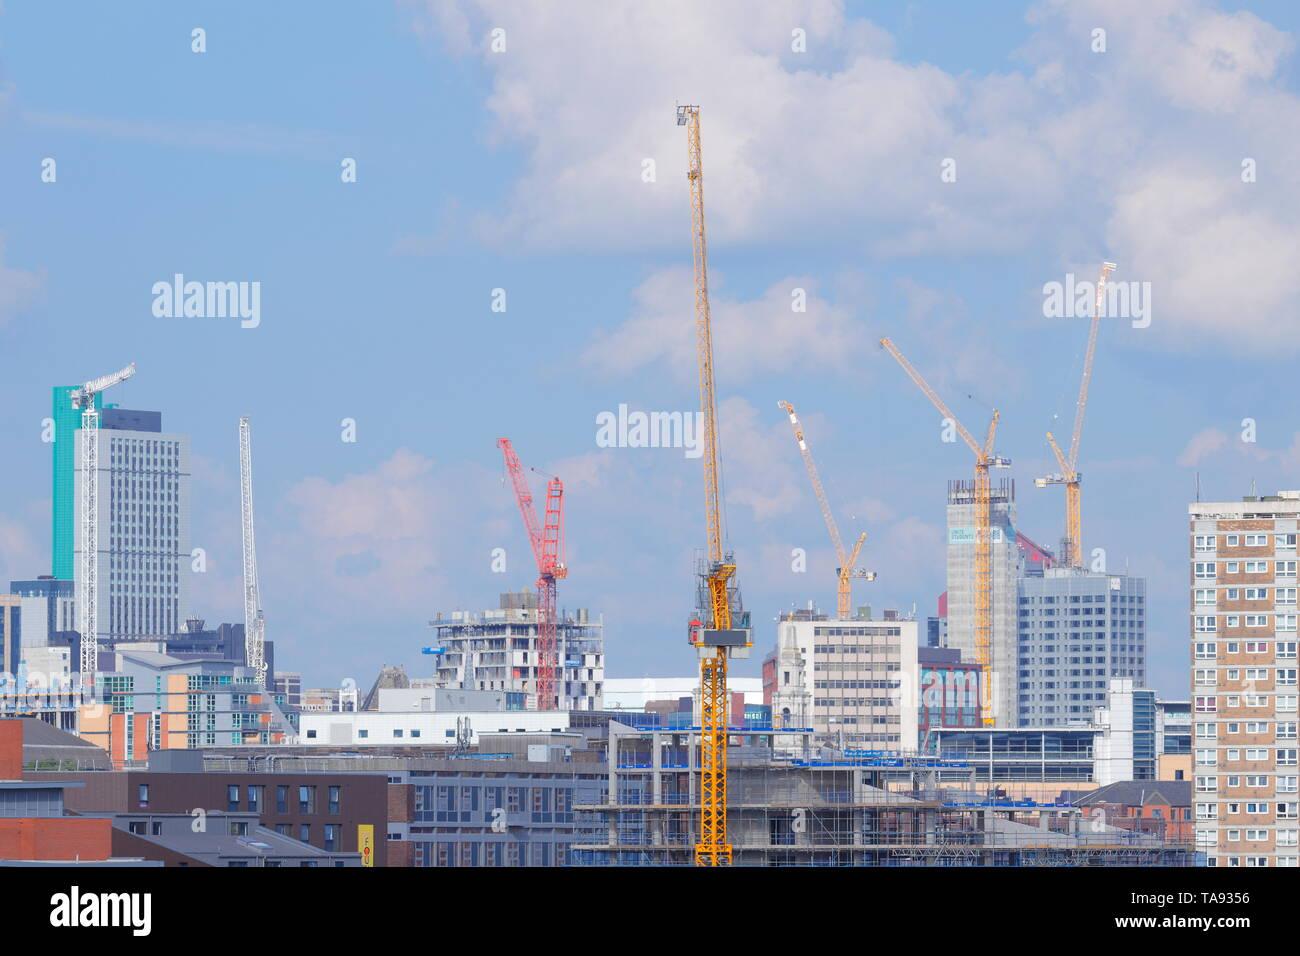 Tower cranes above Leeds skyline - Stock Image